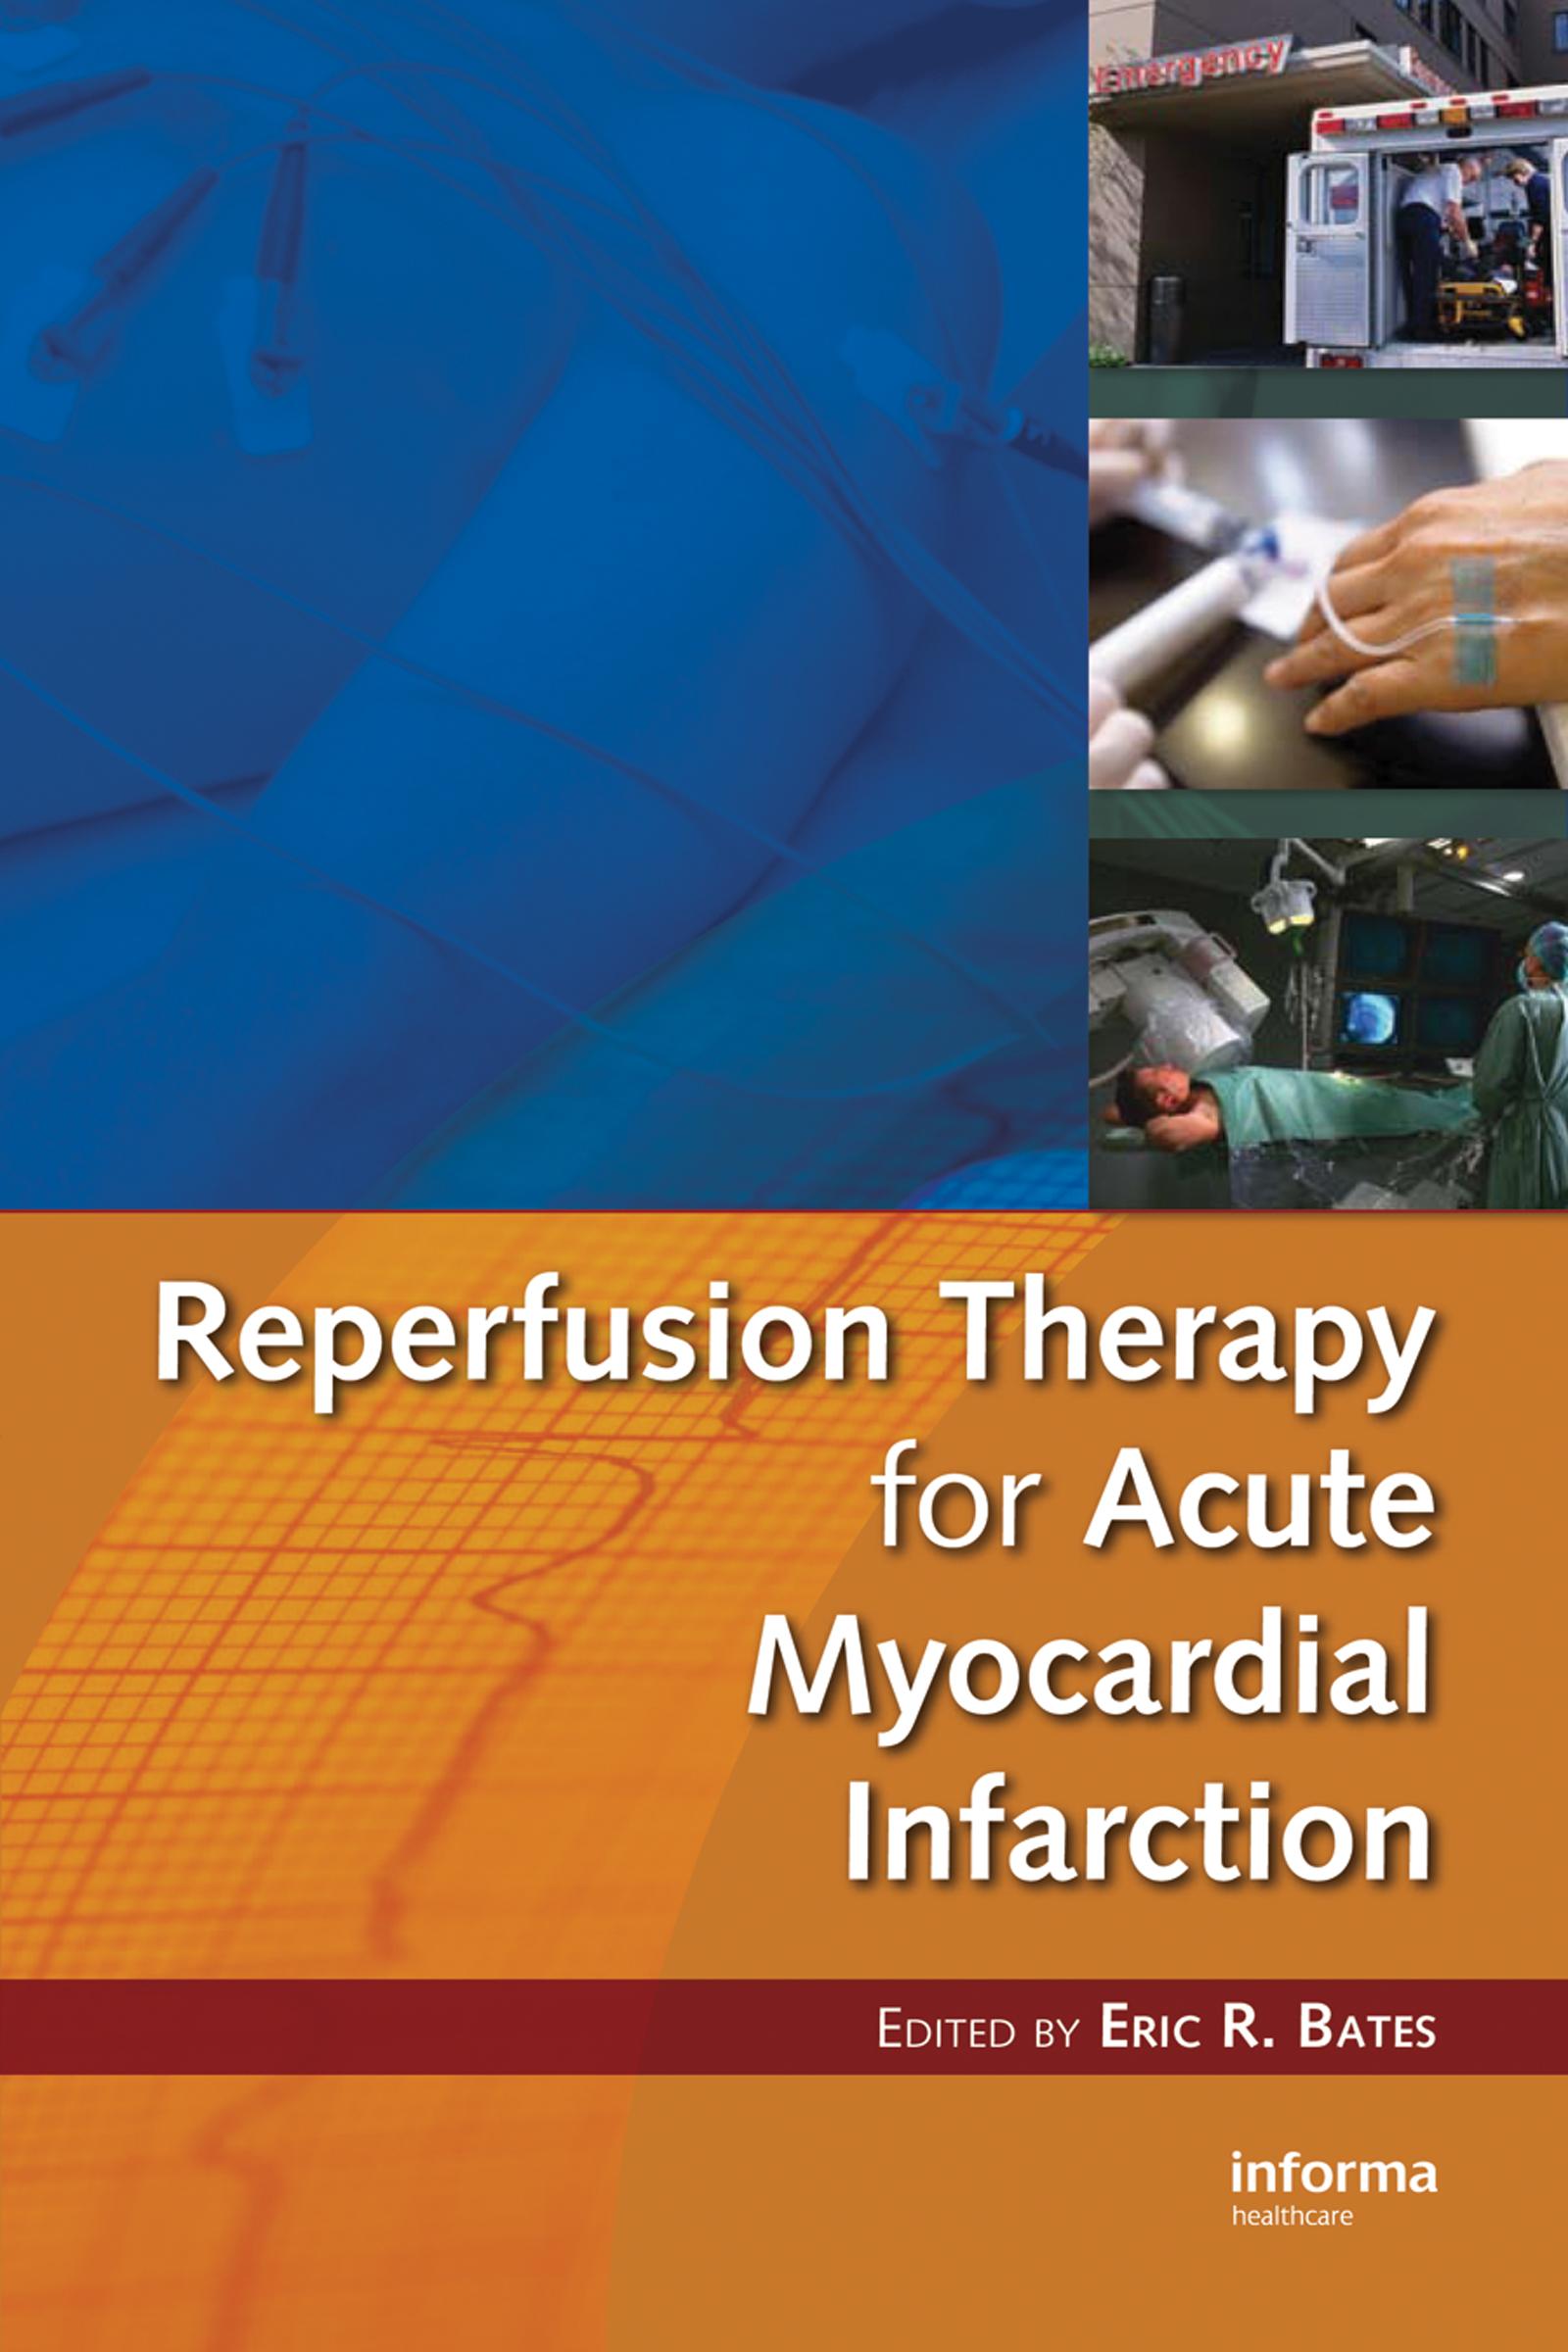 Facilitated Percutaneous Coronary Intervention in Acute Myocardial Infarction